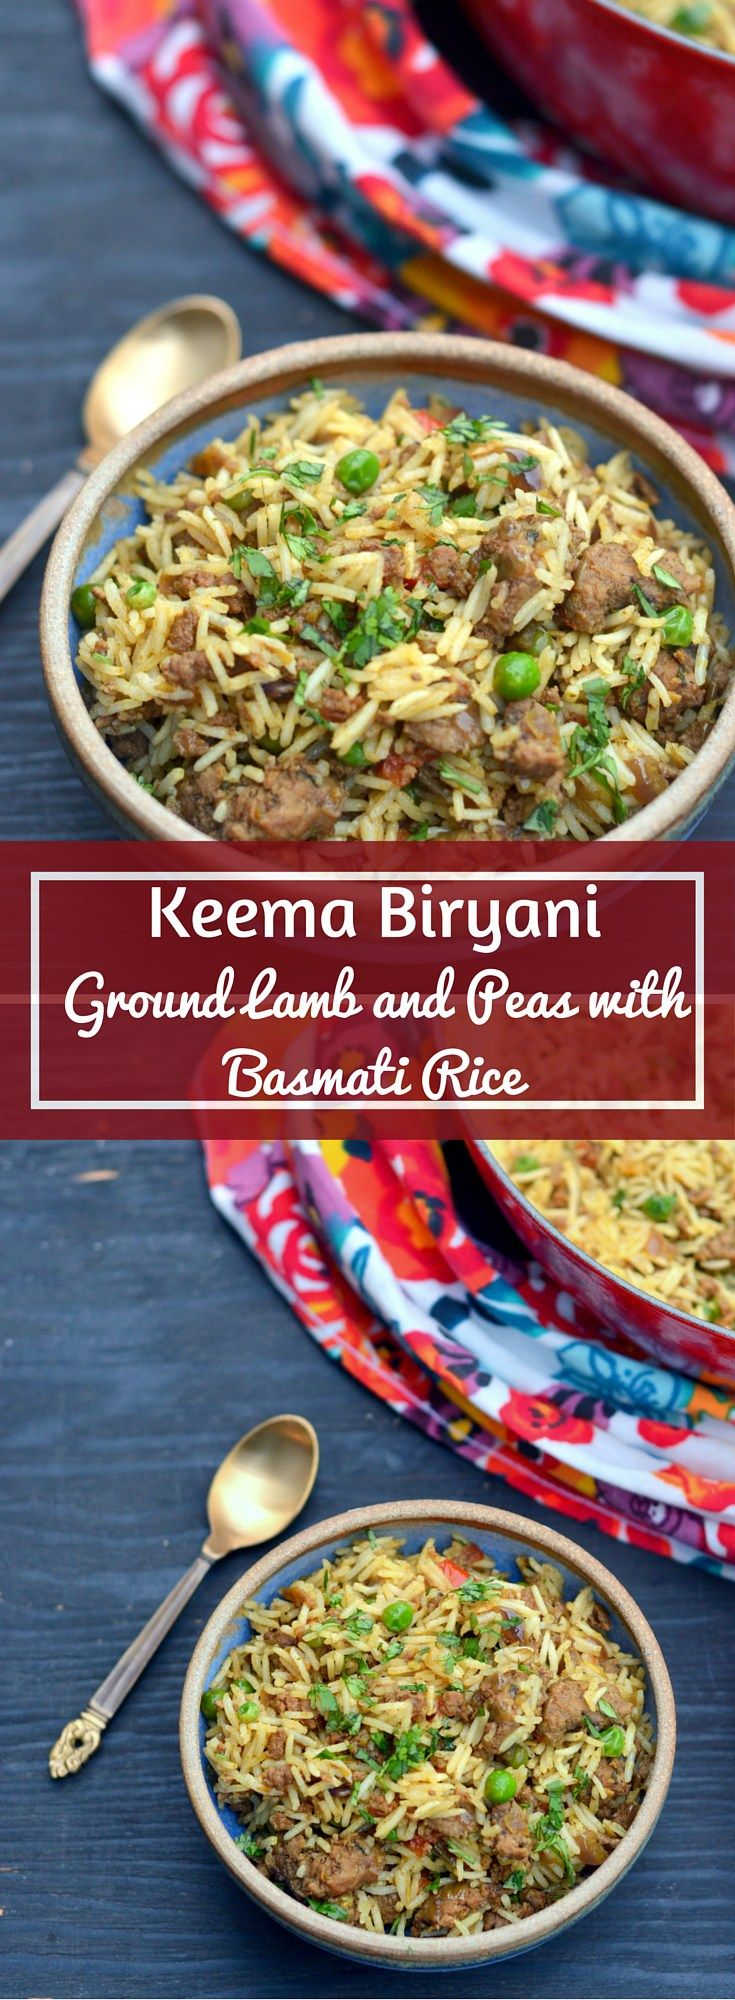 Easy and Delicious Keema Biryani - Biryani with Ground Lamb and Peas - www.cookingcurries.com